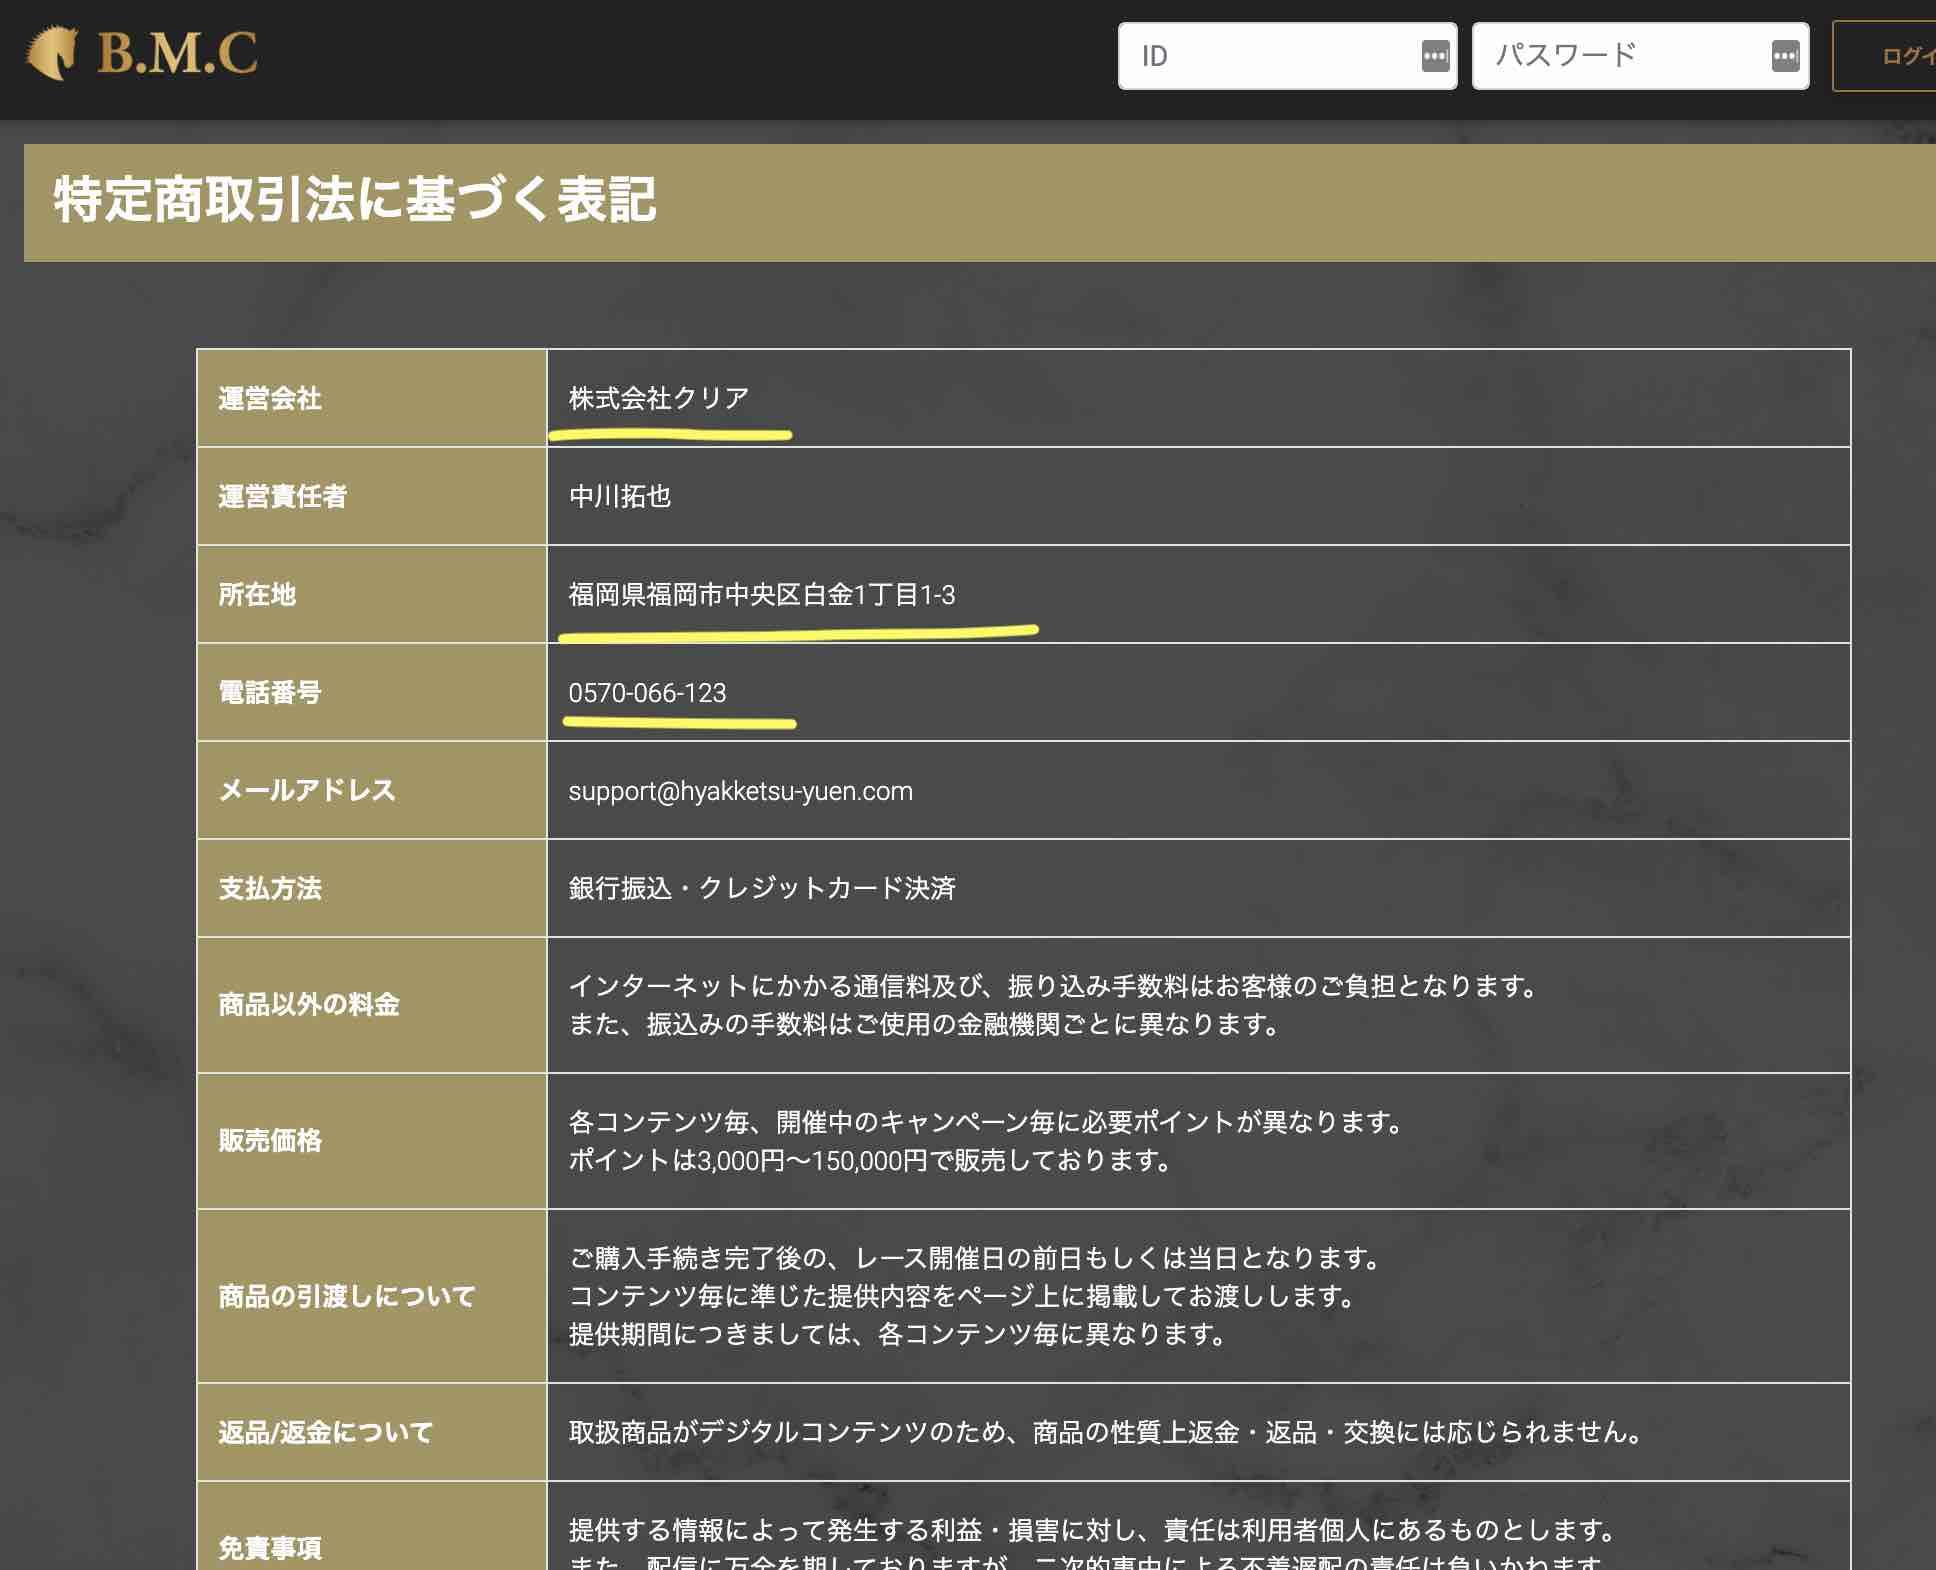 BMC(B.M.C)という競馬予想サイトの運営社